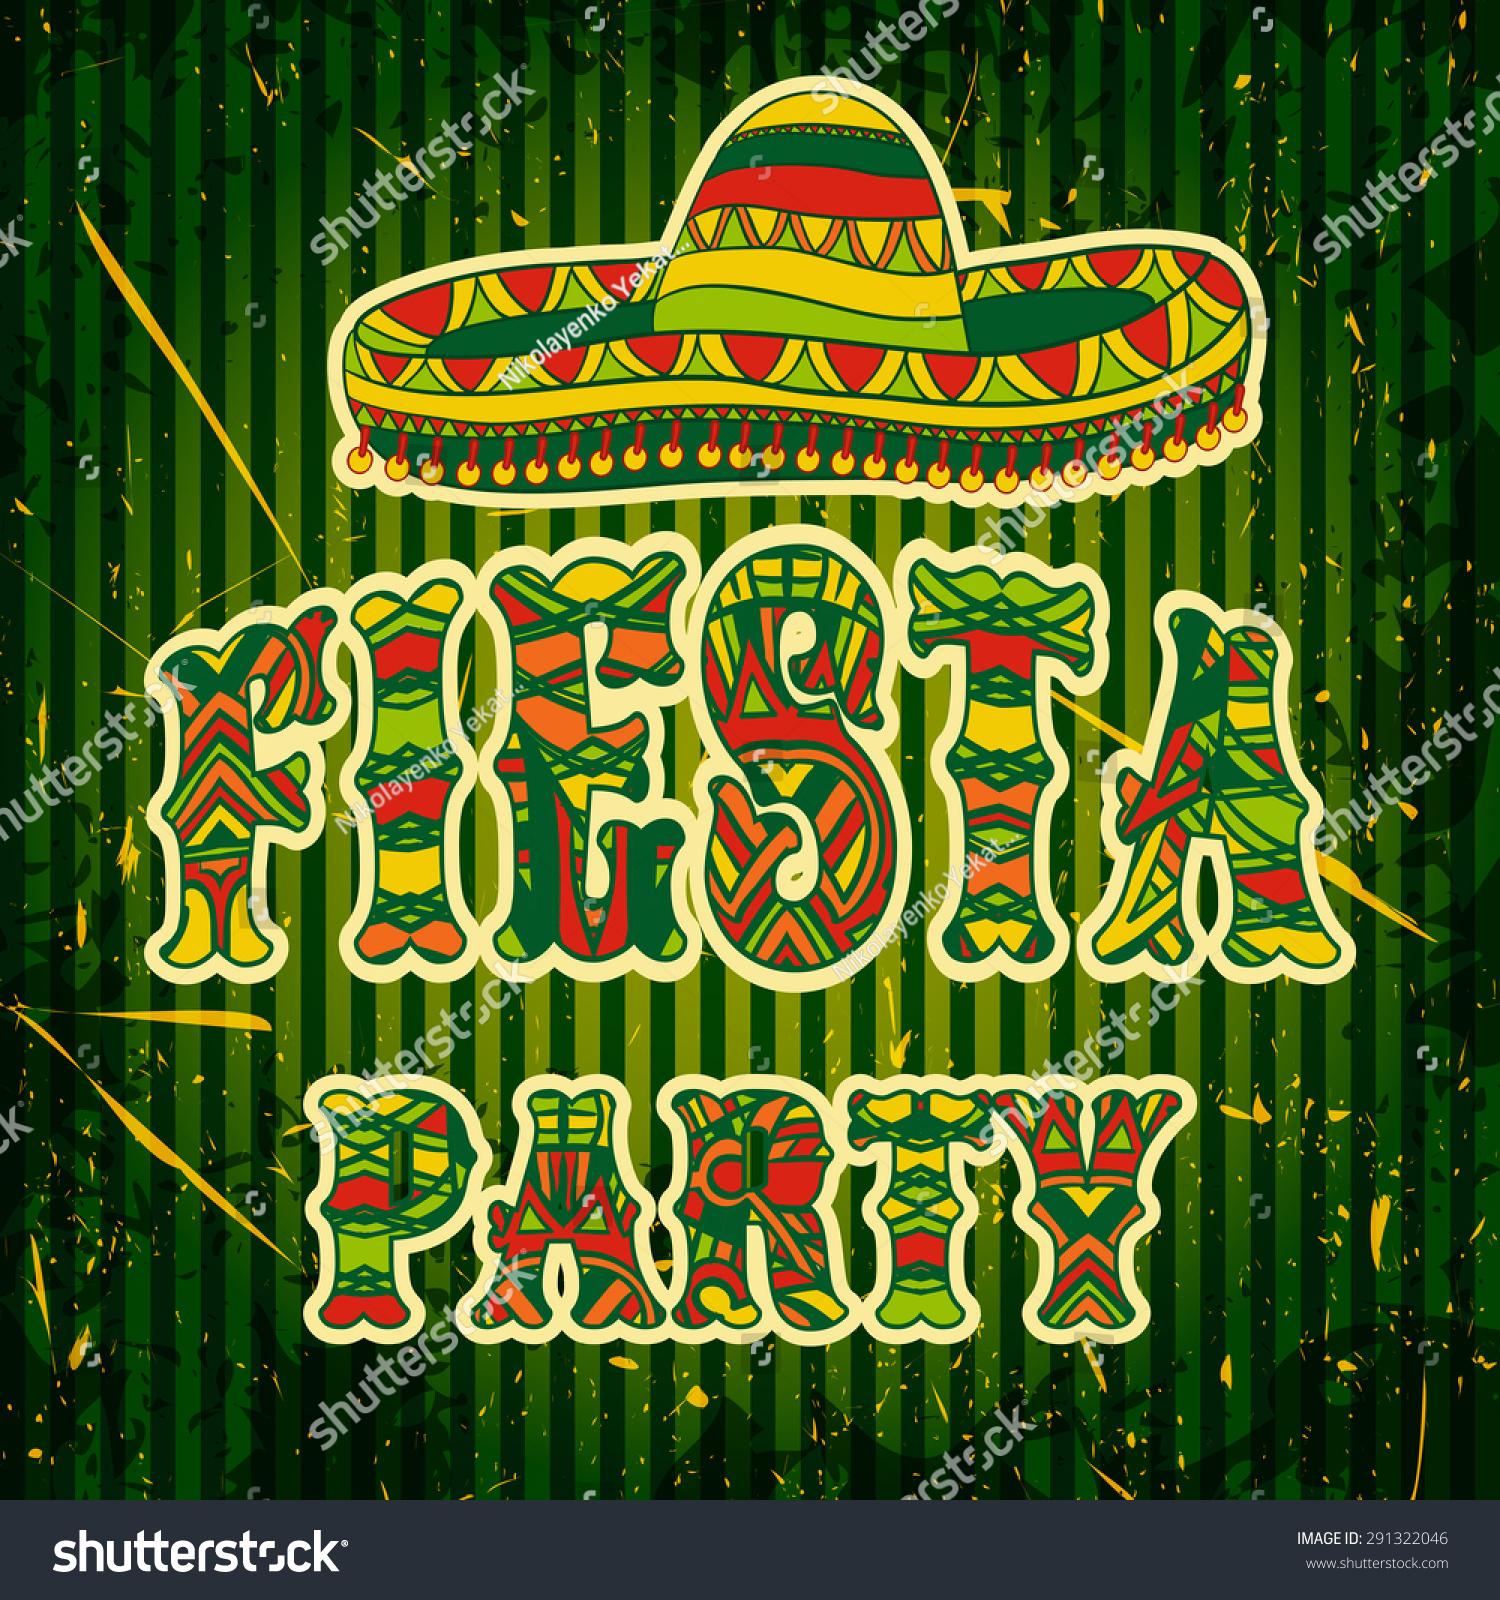 Mexican Fiesta Party Invitation Sombrero Colorful Vector – Mexican Themed Party Invitations